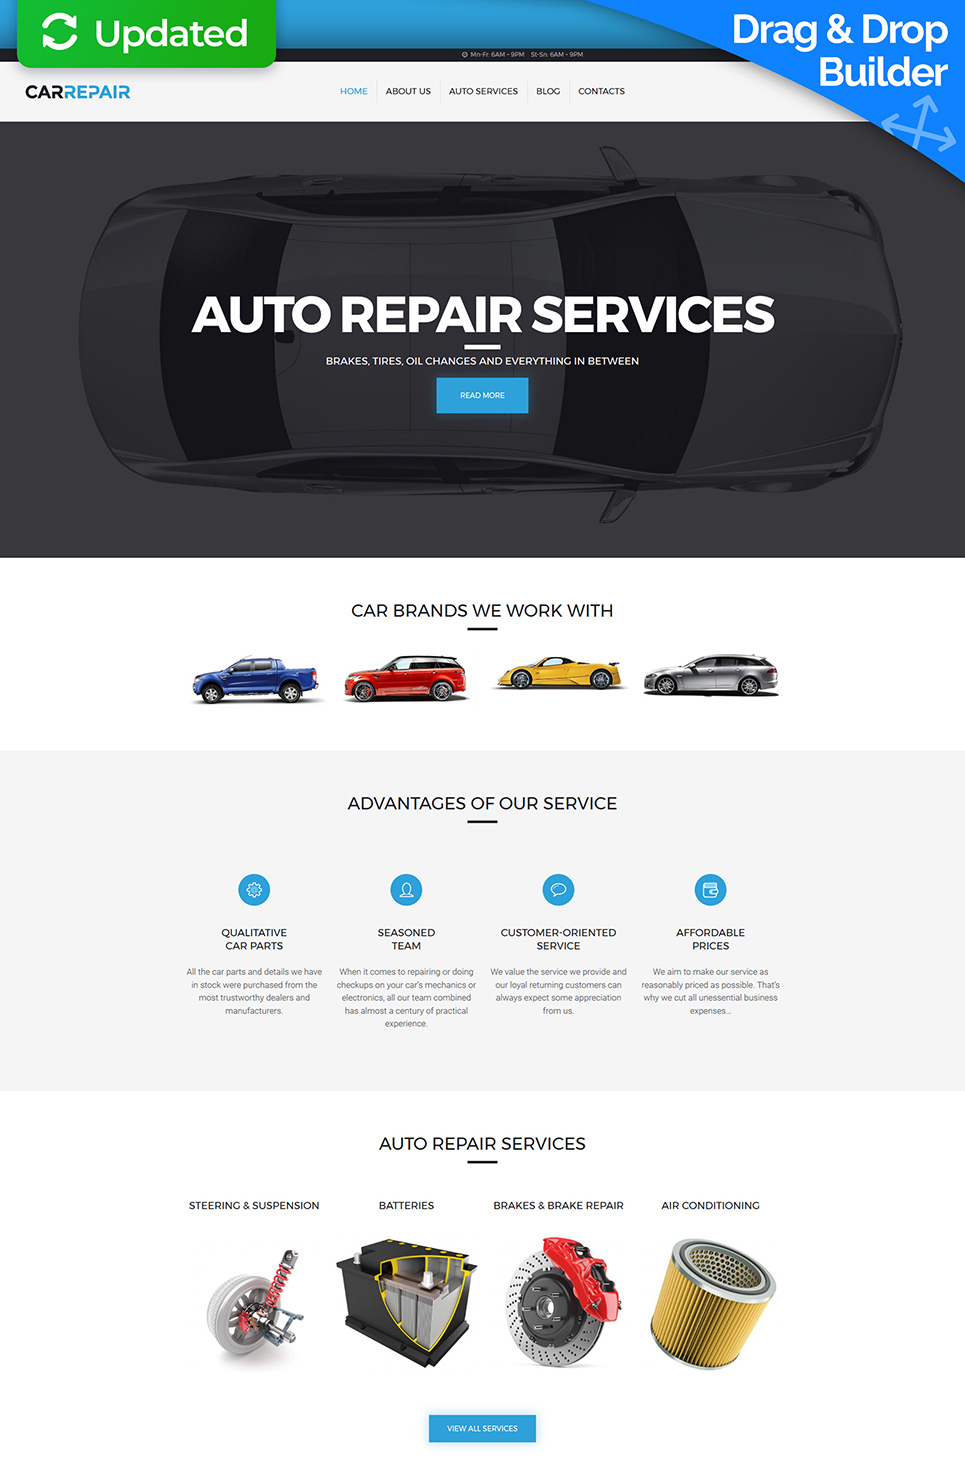 Auto Service Responsive Website Template - image